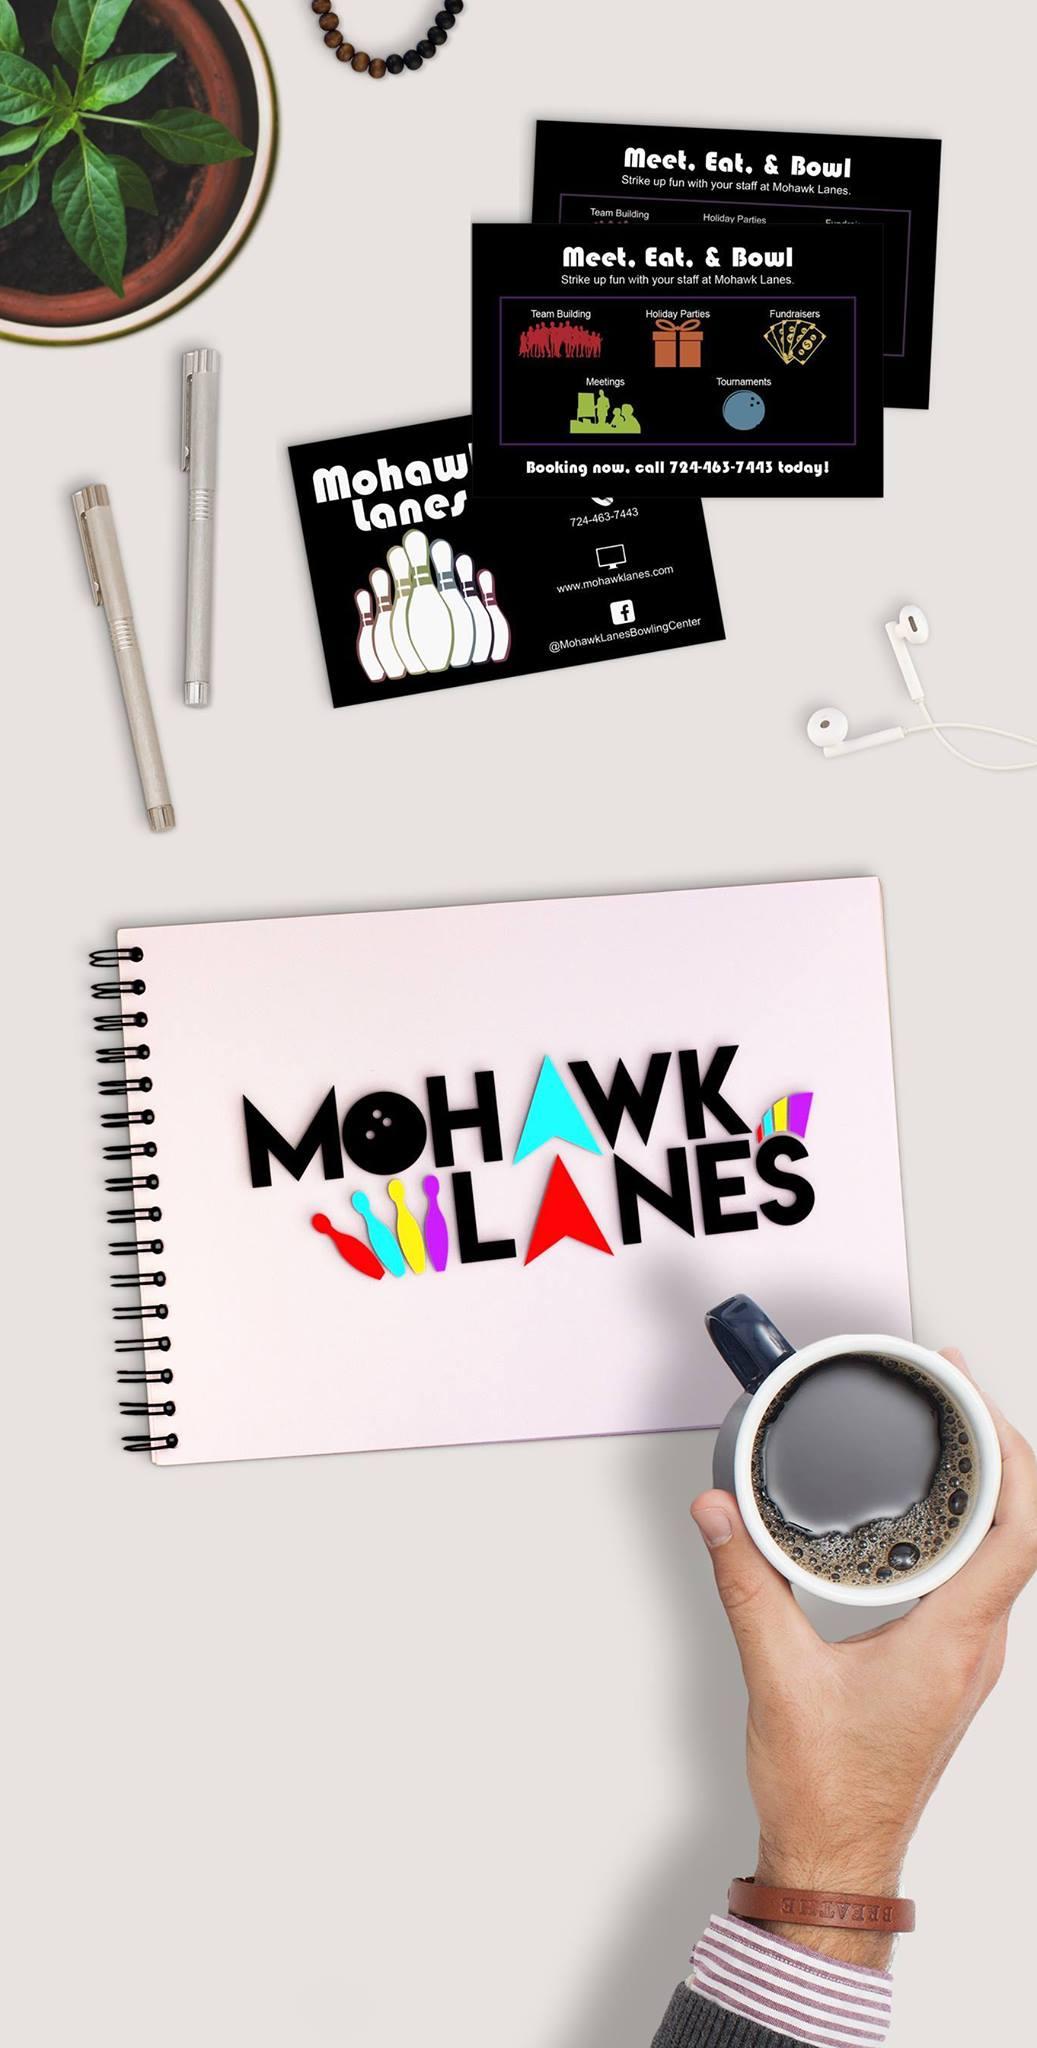 mohawk lanes